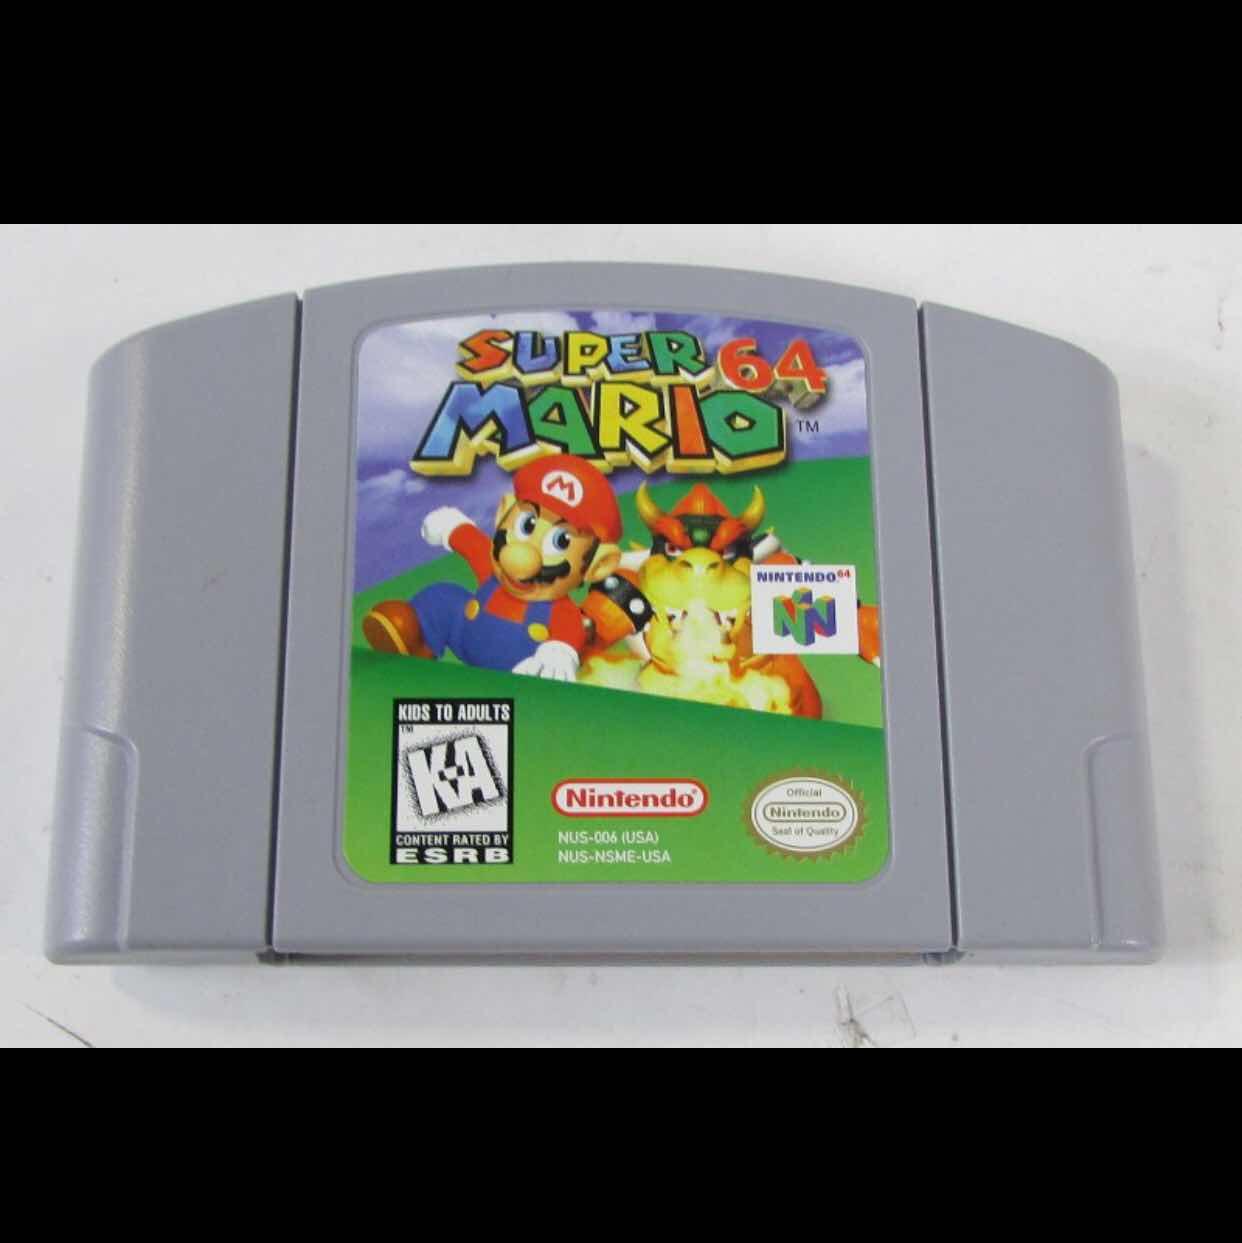 Super Mario 64 - Nintendo 64 Games (New) - Gameflip